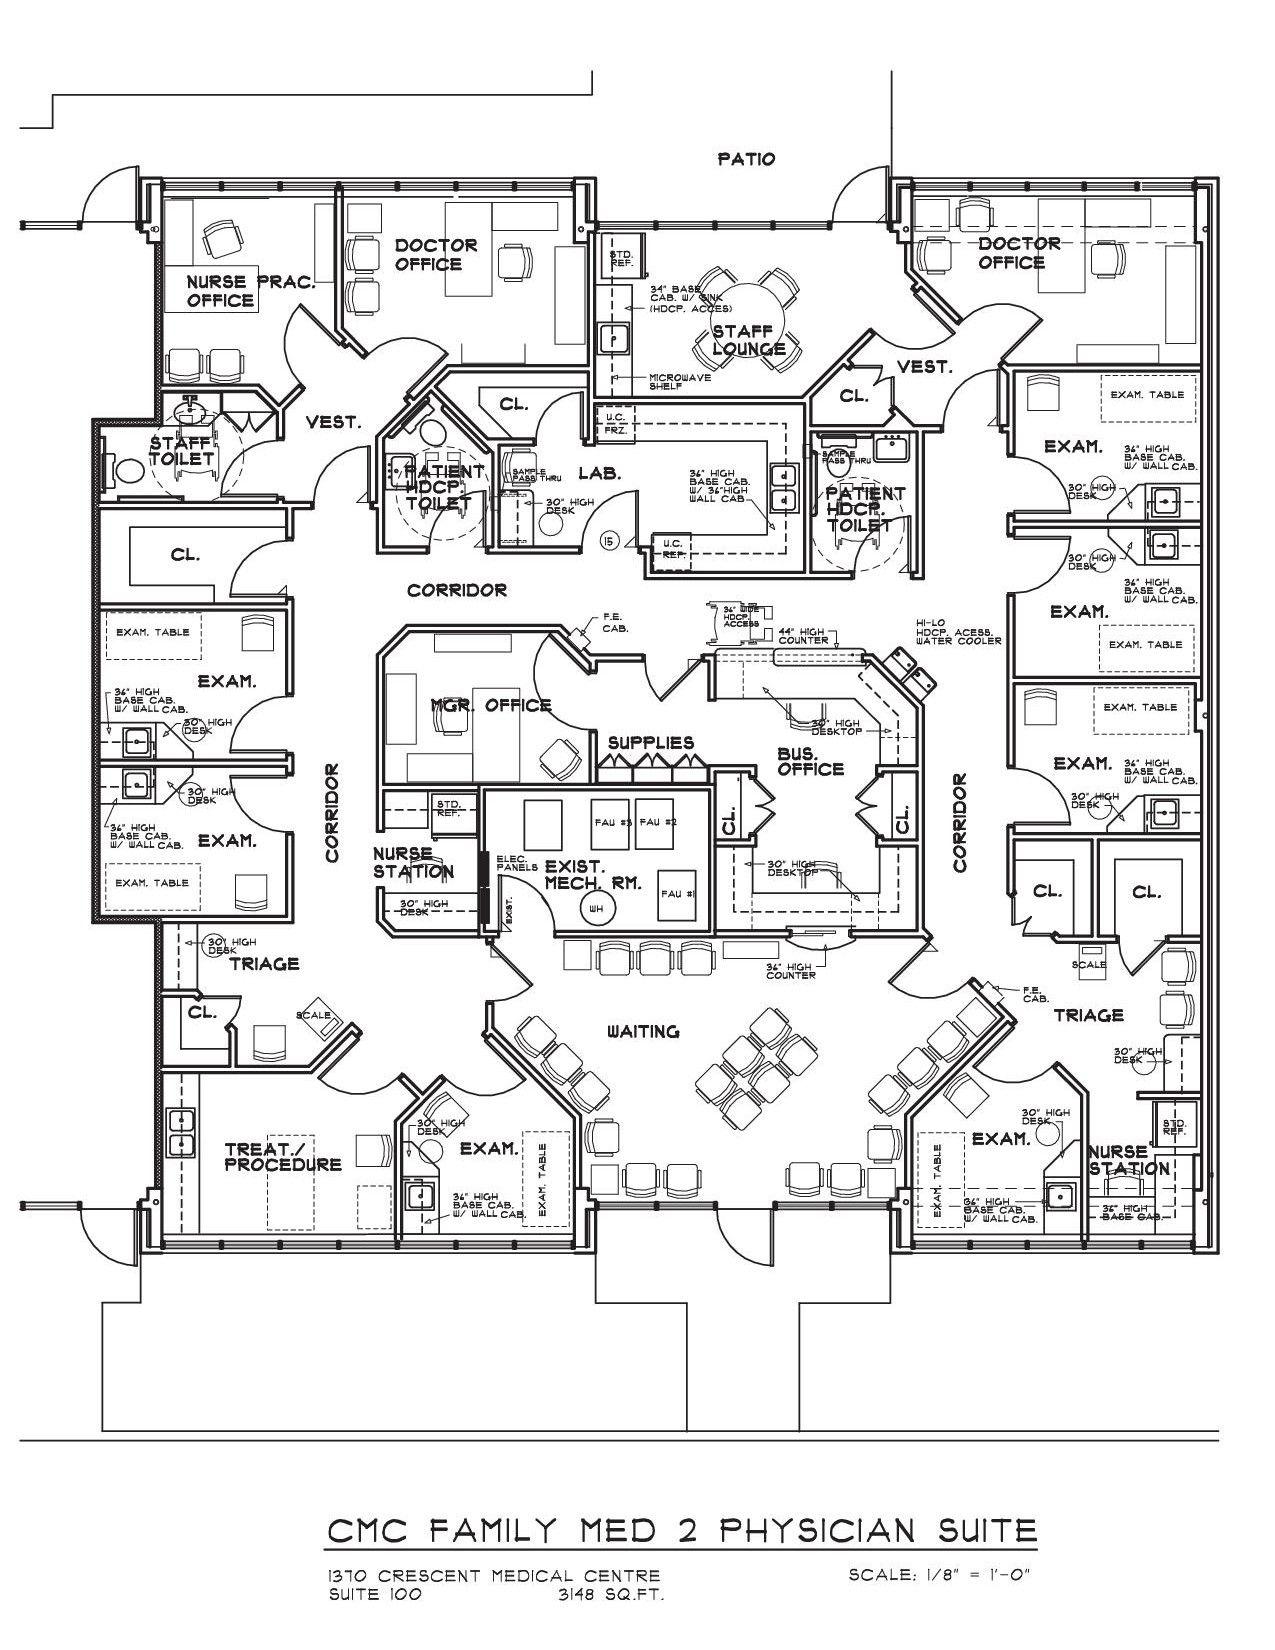 Endoscopy Room Design: 평면도, 건축, 스케치